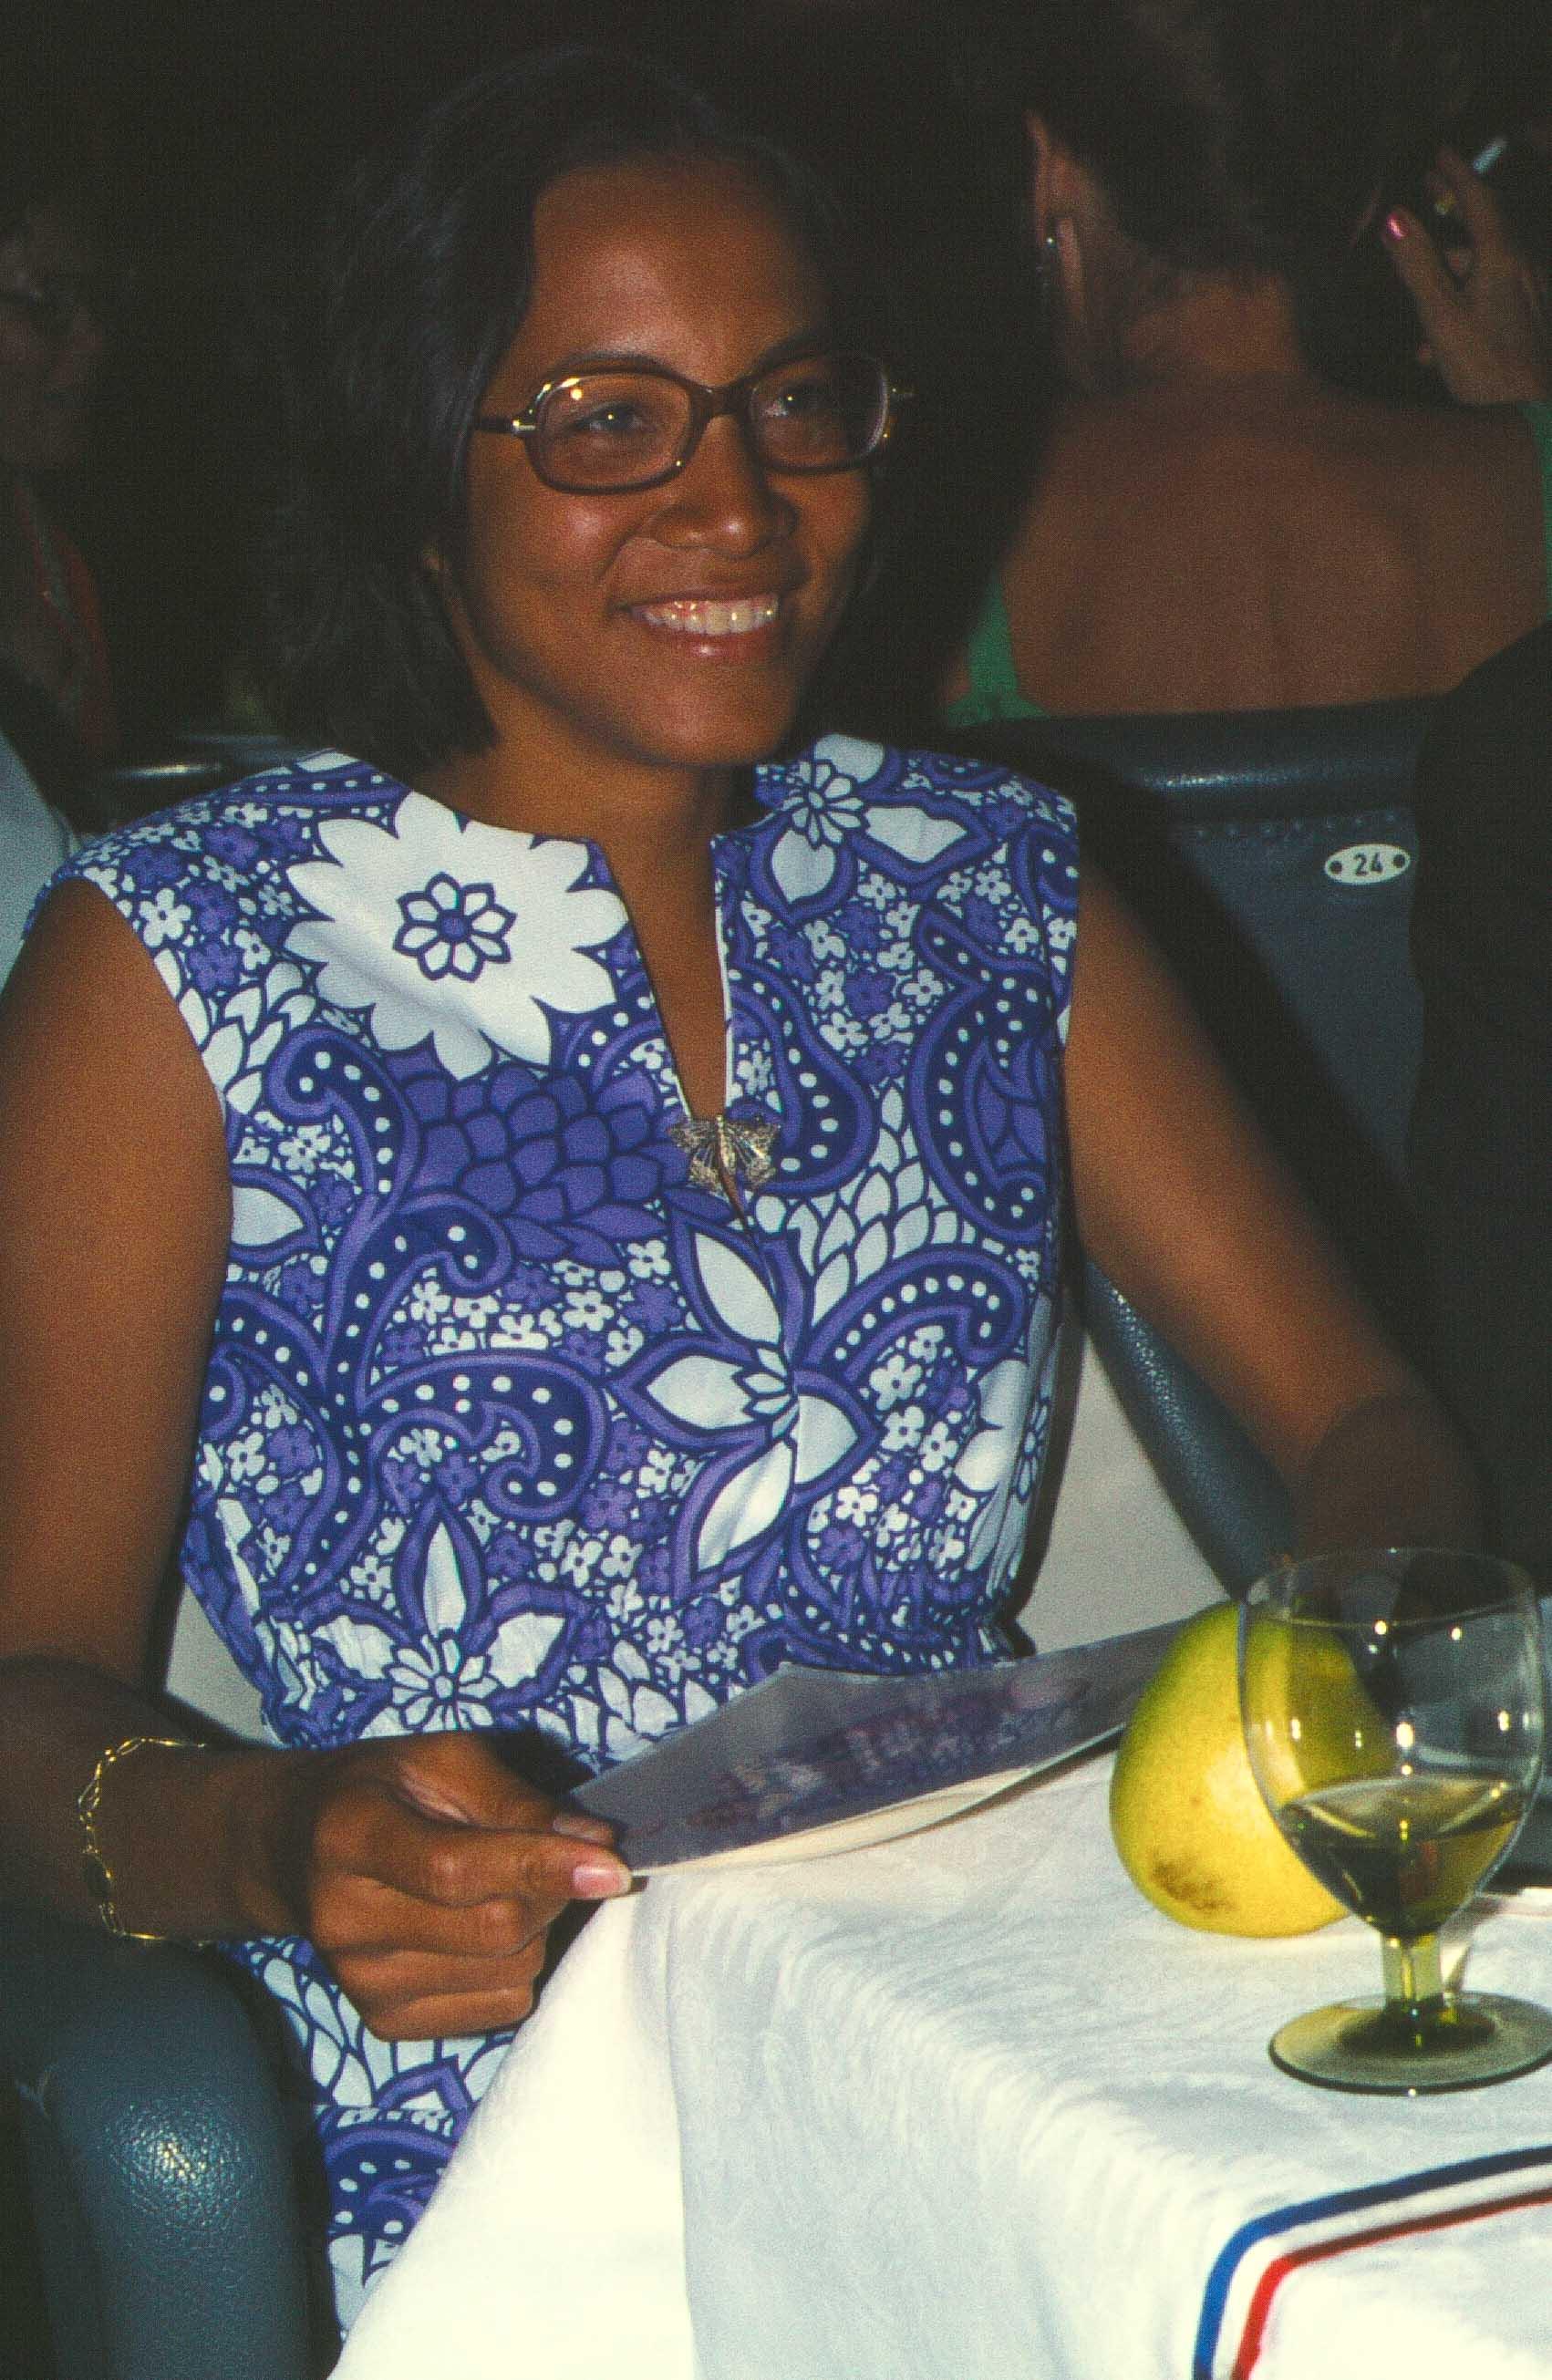 619. Suriname